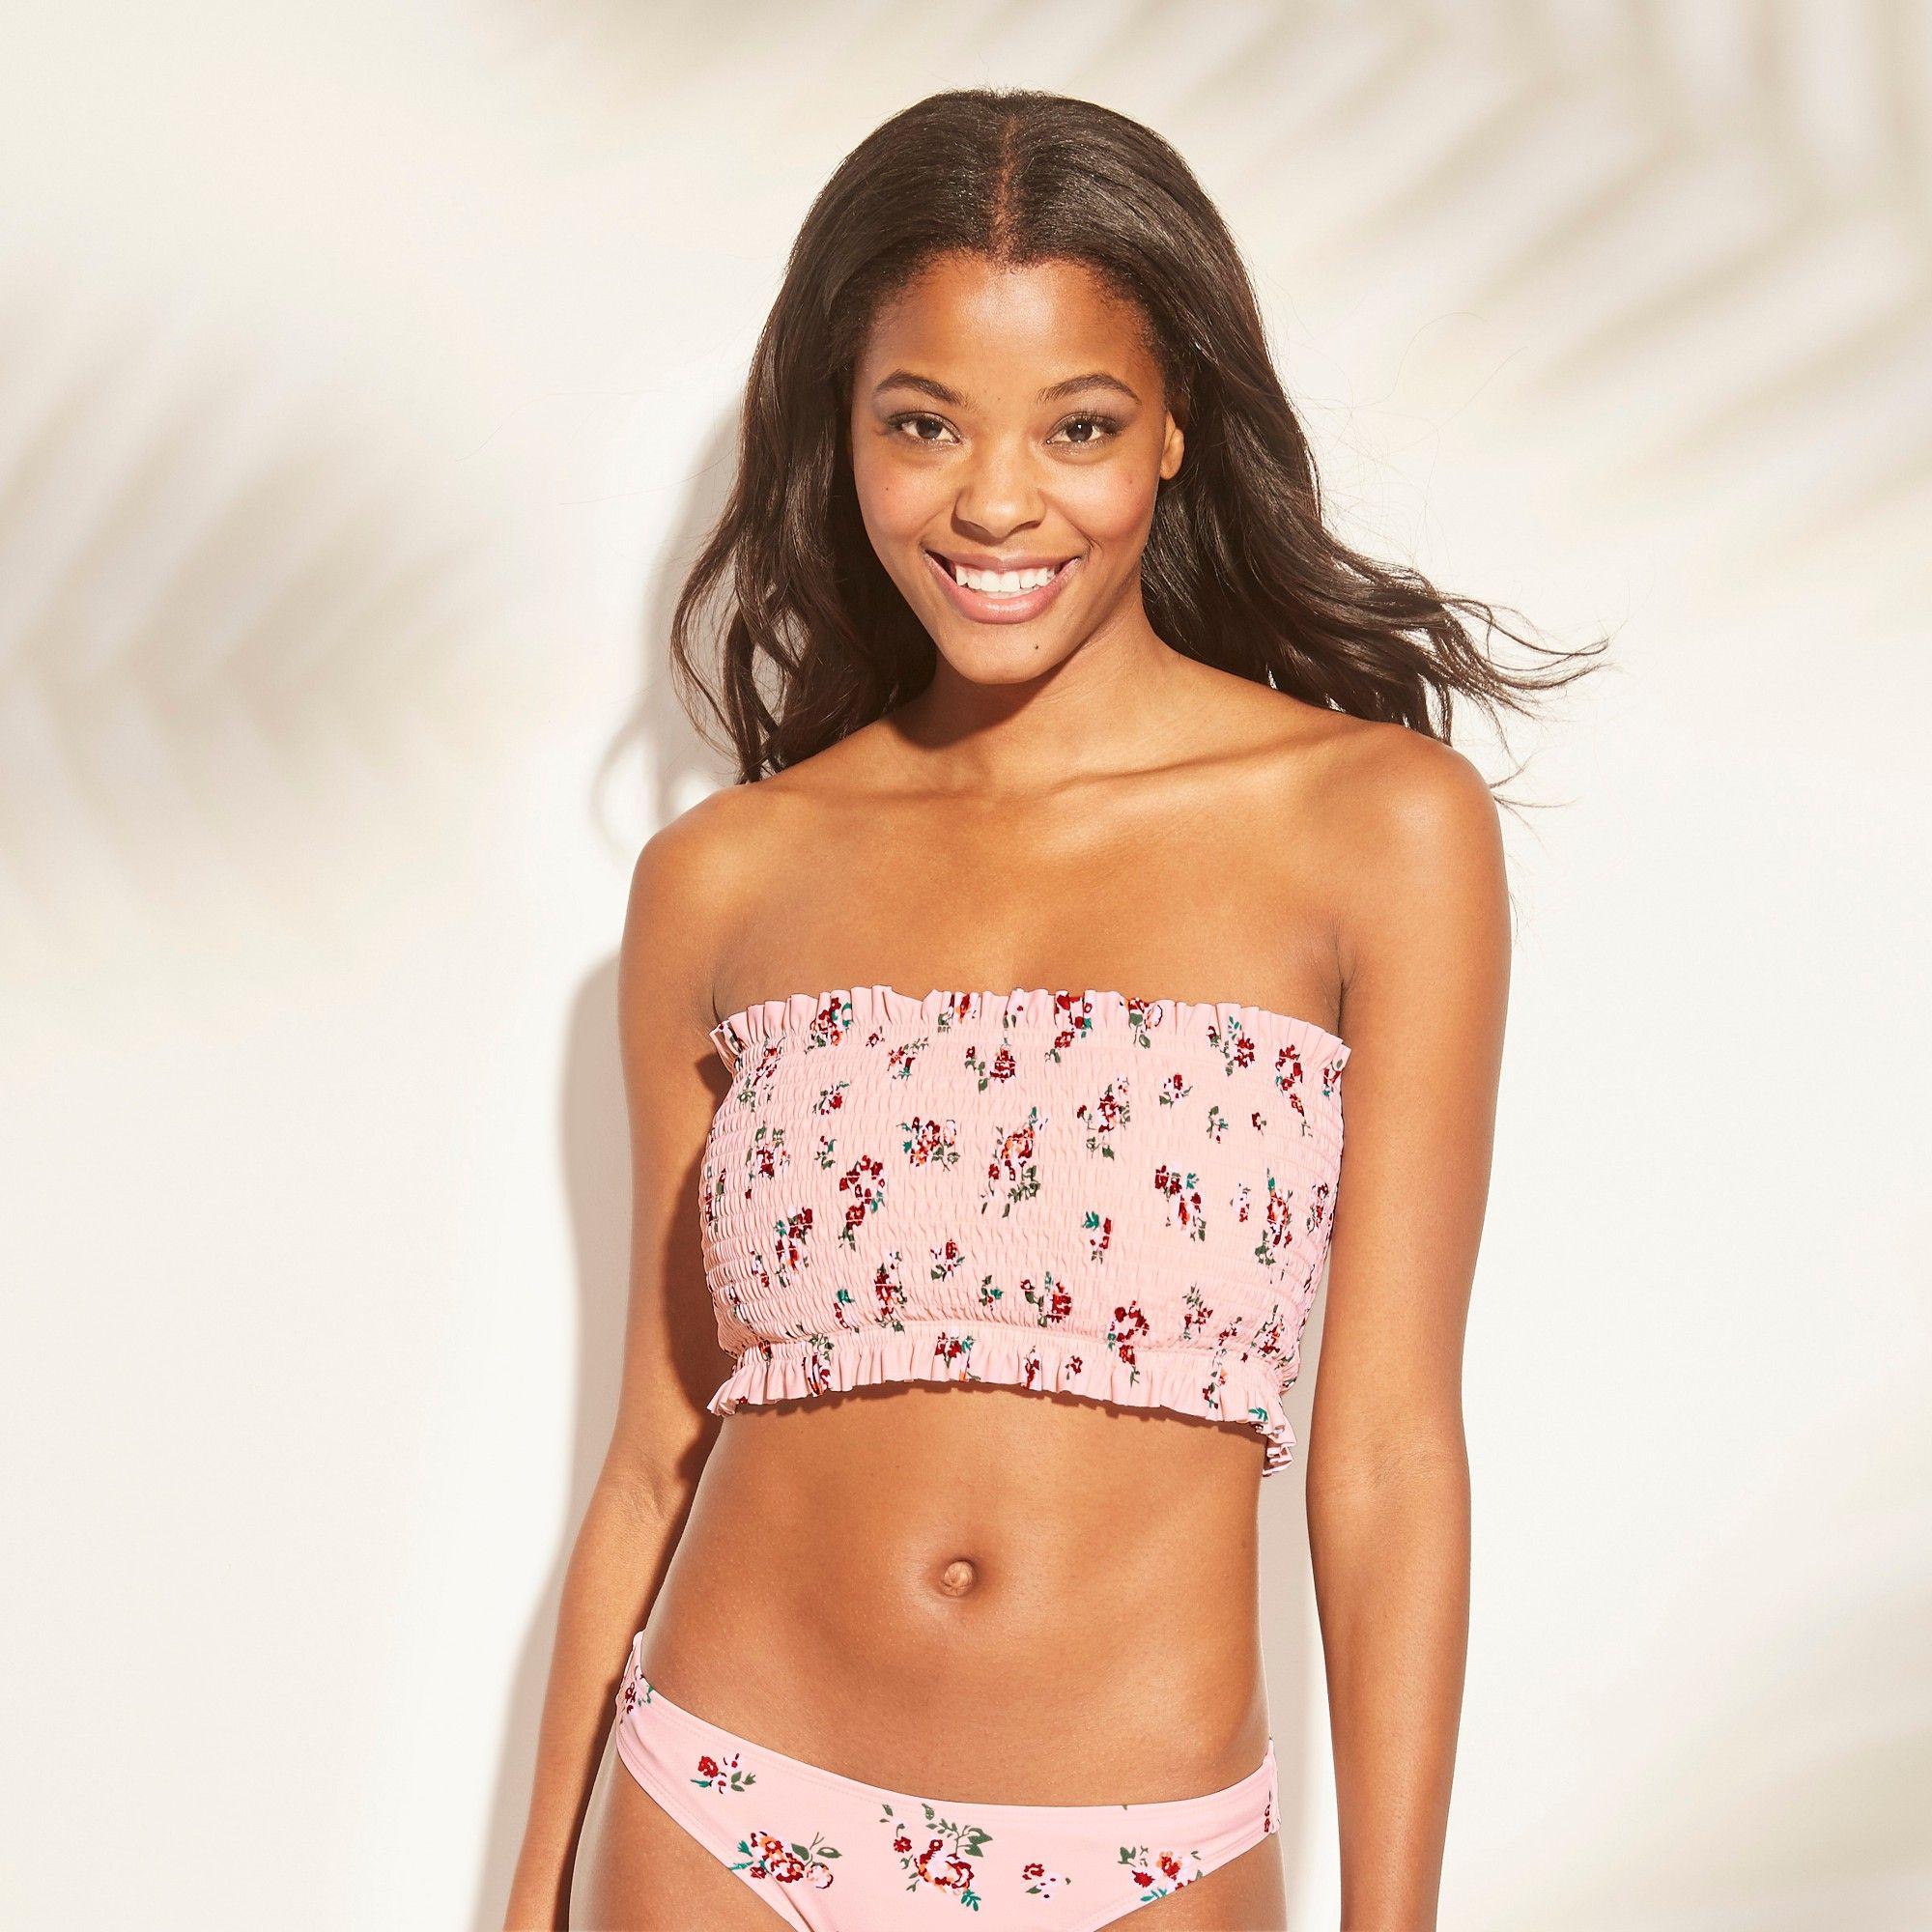 Pink Bandeau Style Bikini with Striped Bottom Childrens Size 10